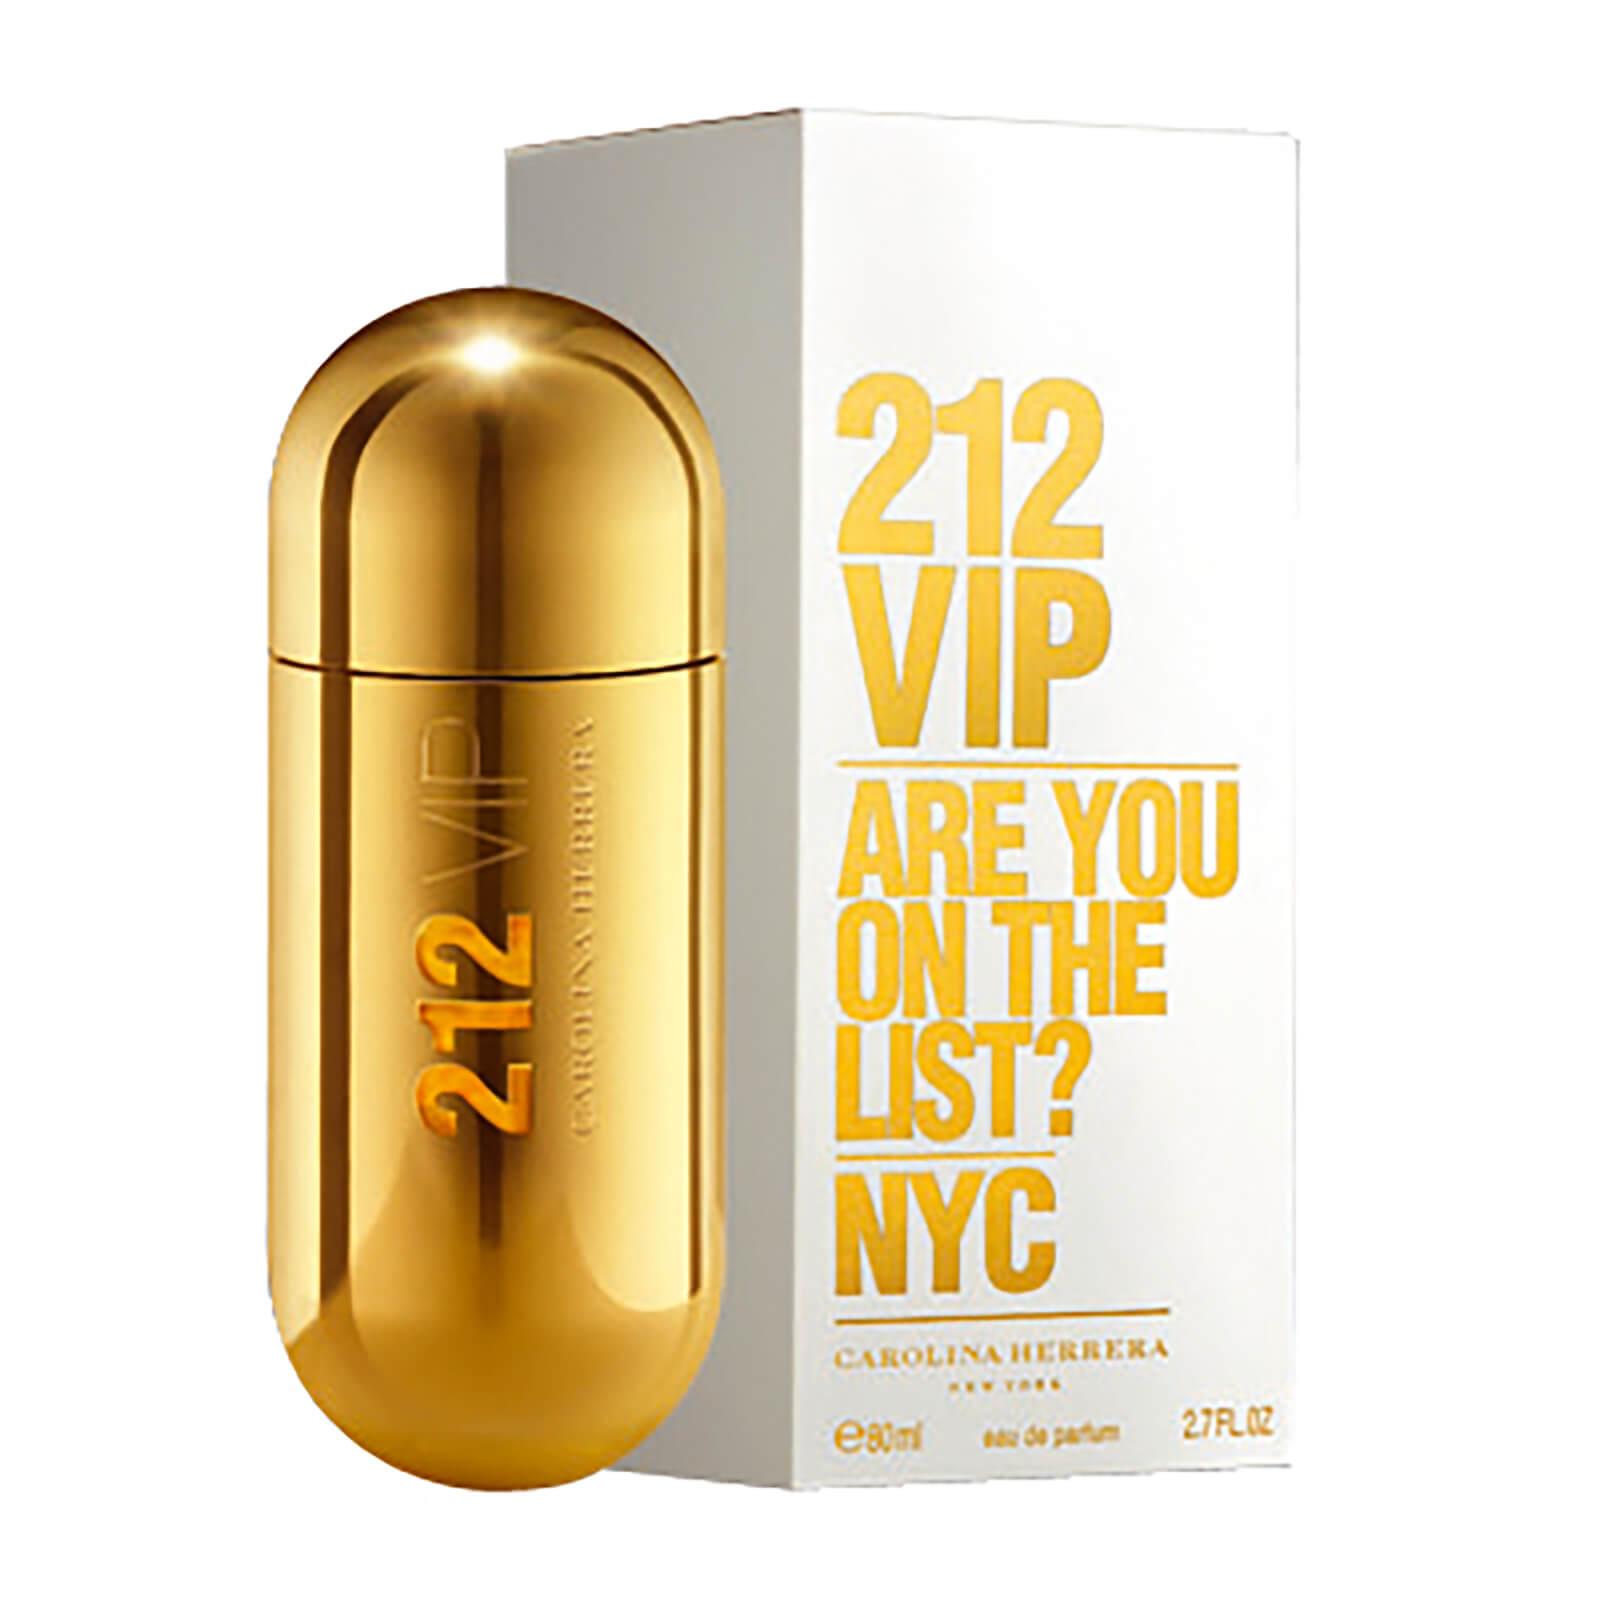 Carolina Herrera 212 Vip Eau De Parfum 80ml Free Shipping